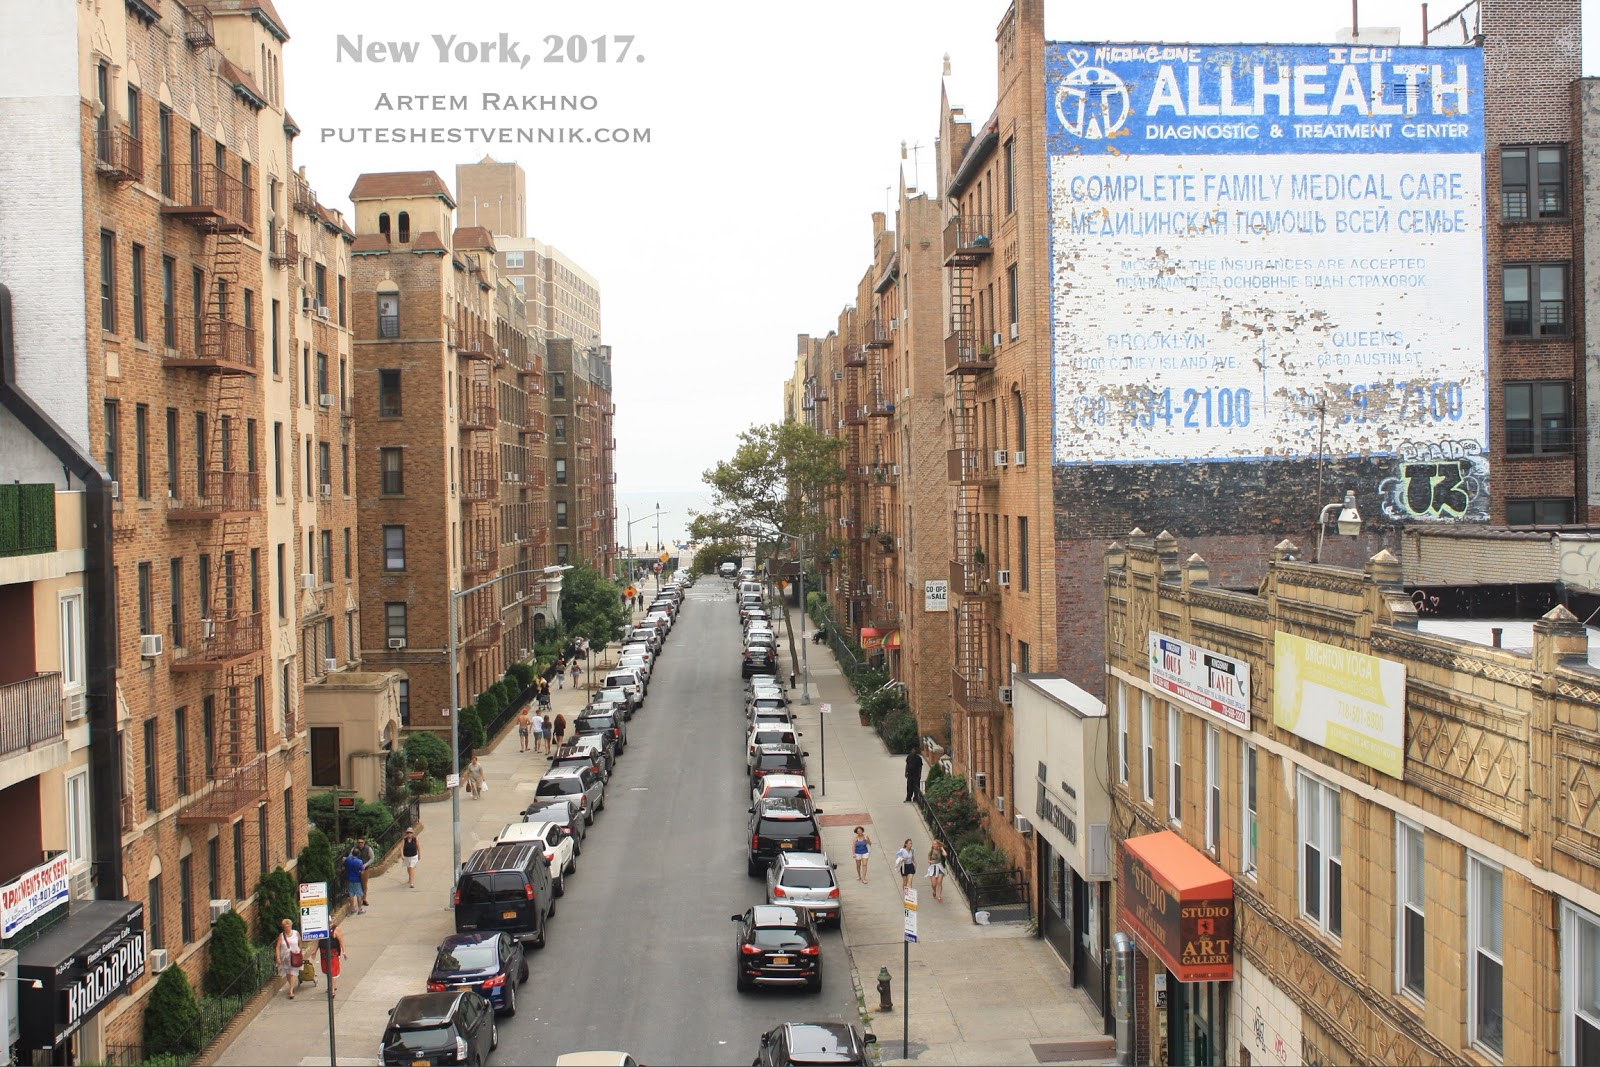 Улица в русском районе Нью-Йорка